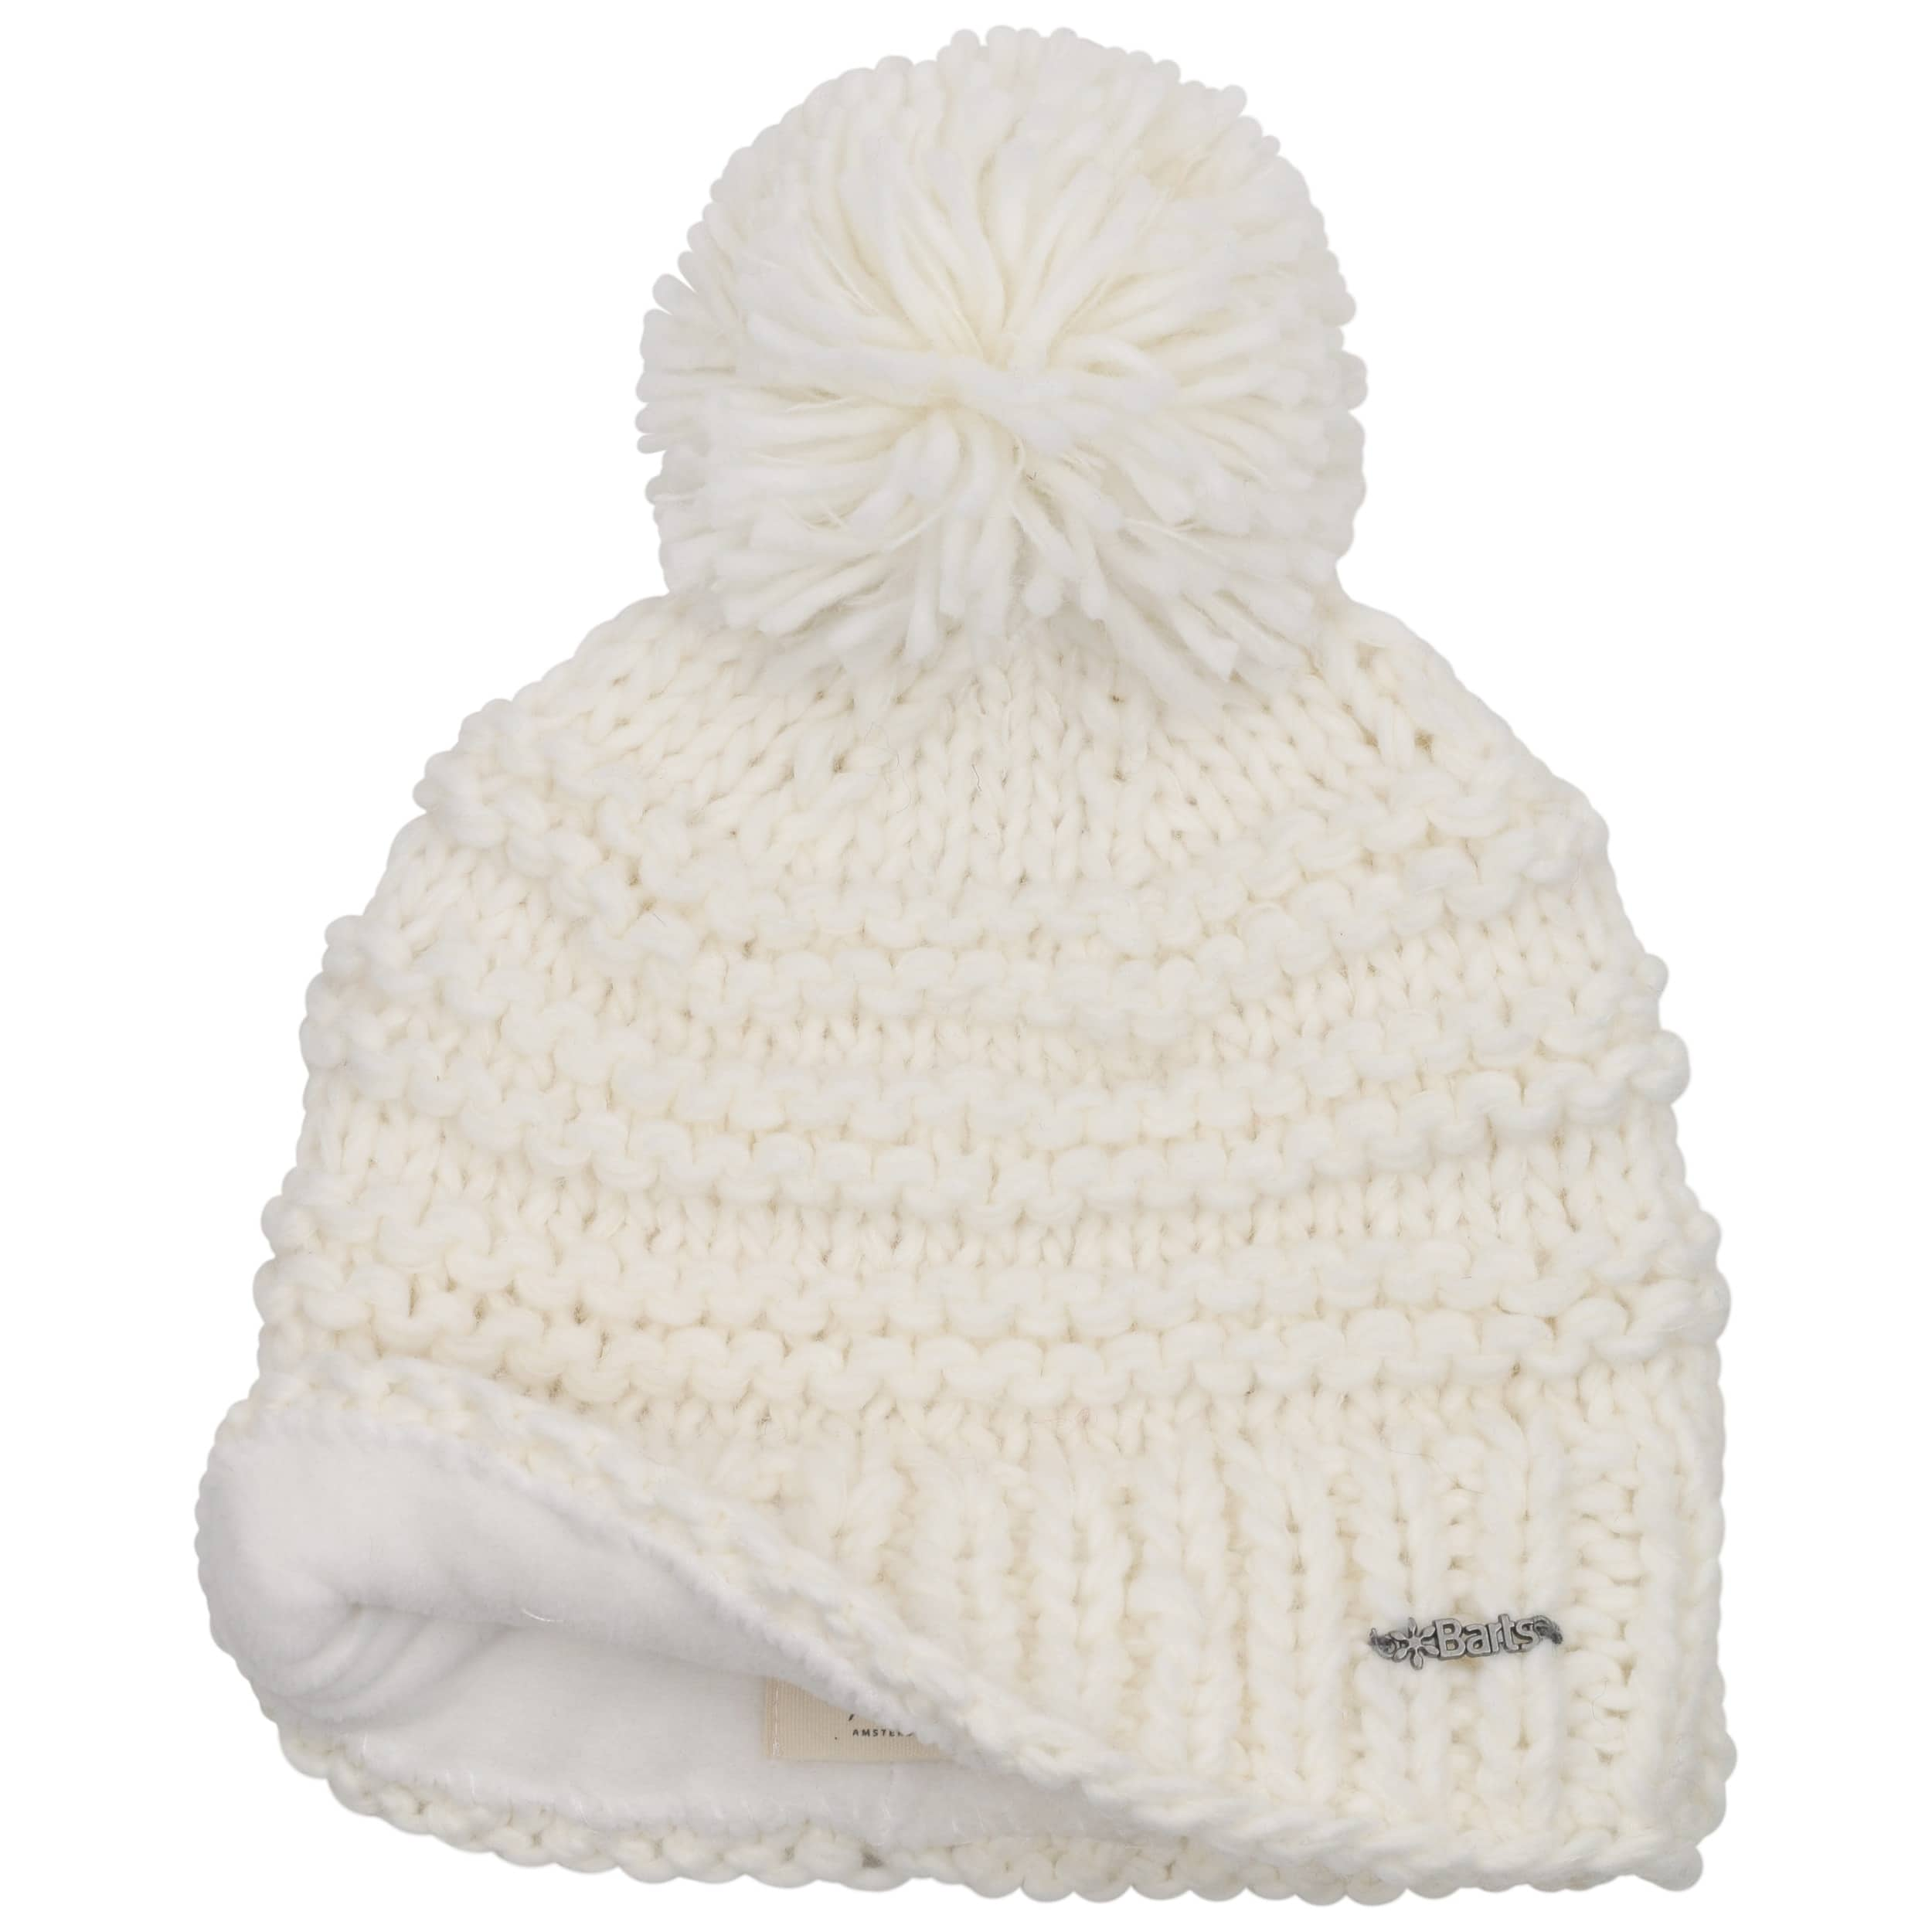 e4032aedf023b Beanie Jasmin by Barts - Gorros - sombreroshop.es